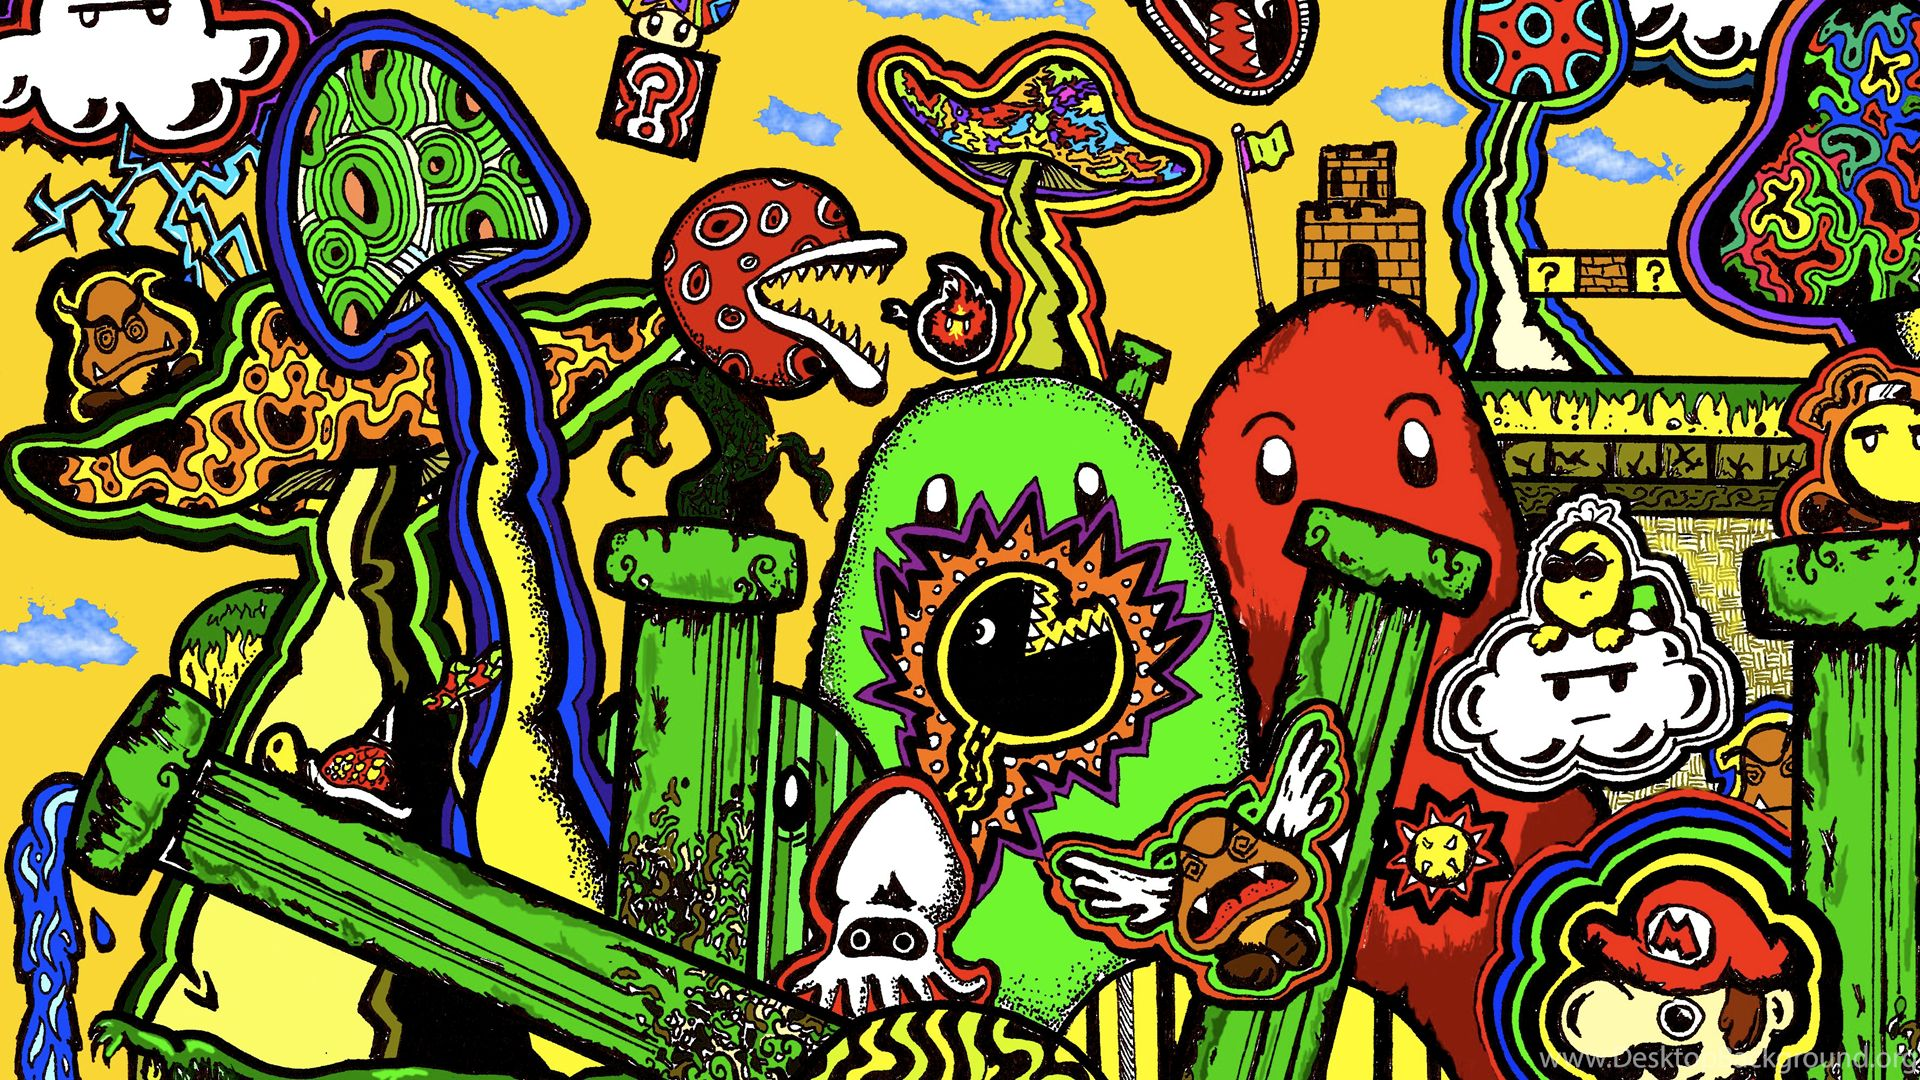 Trippy Rasta Background Wallpaper HD